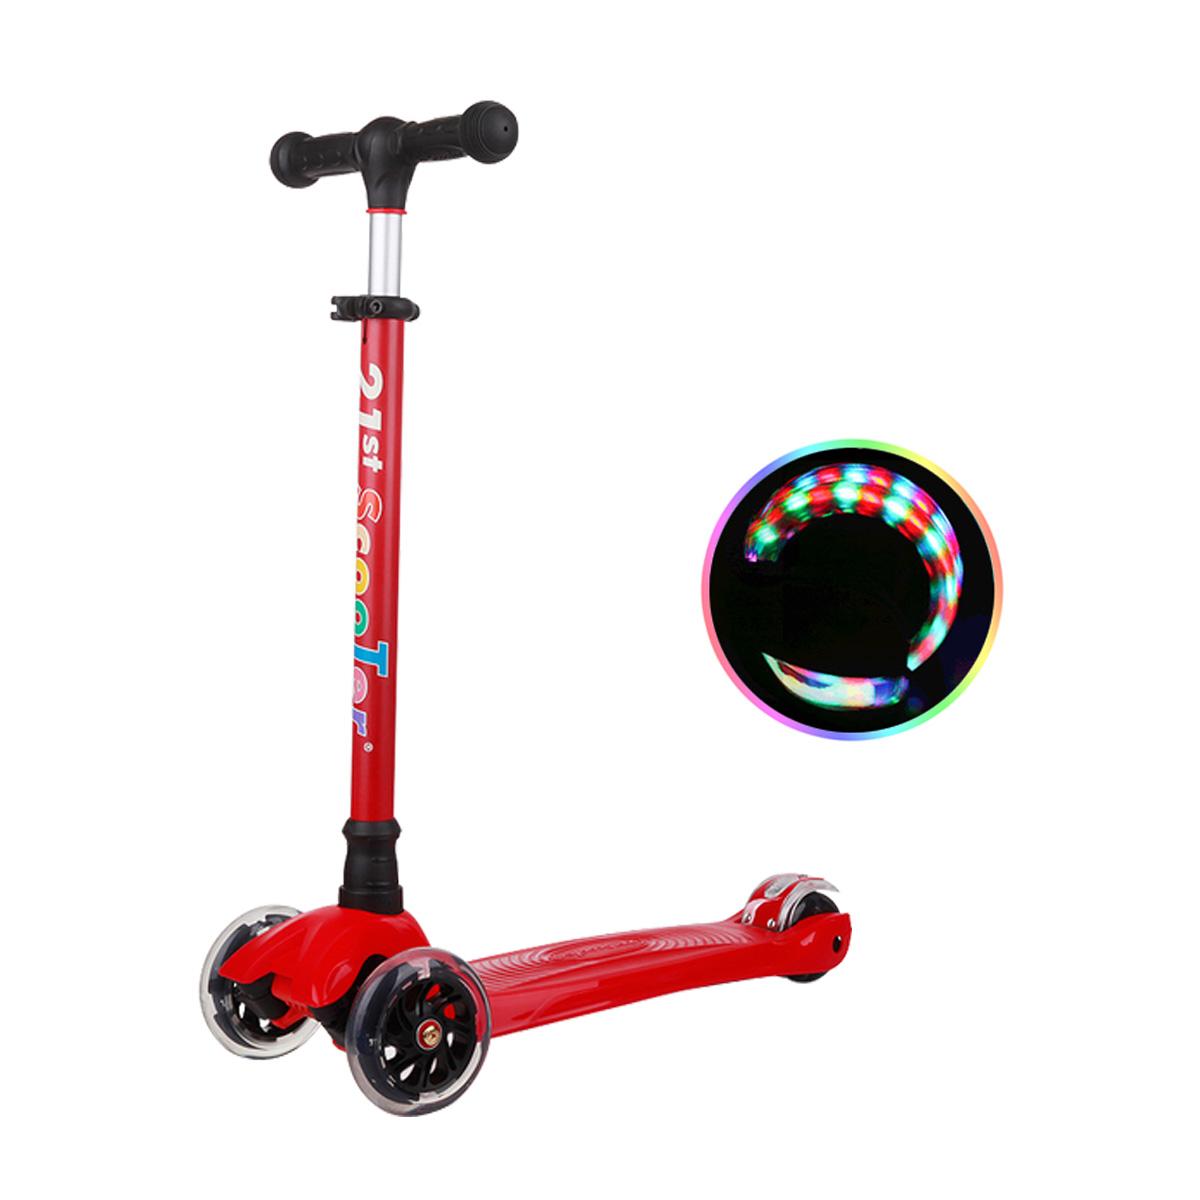 21st ScooTer 아동용 킥보드, 04_21st scooter 컬러플 착탈식 빨강.